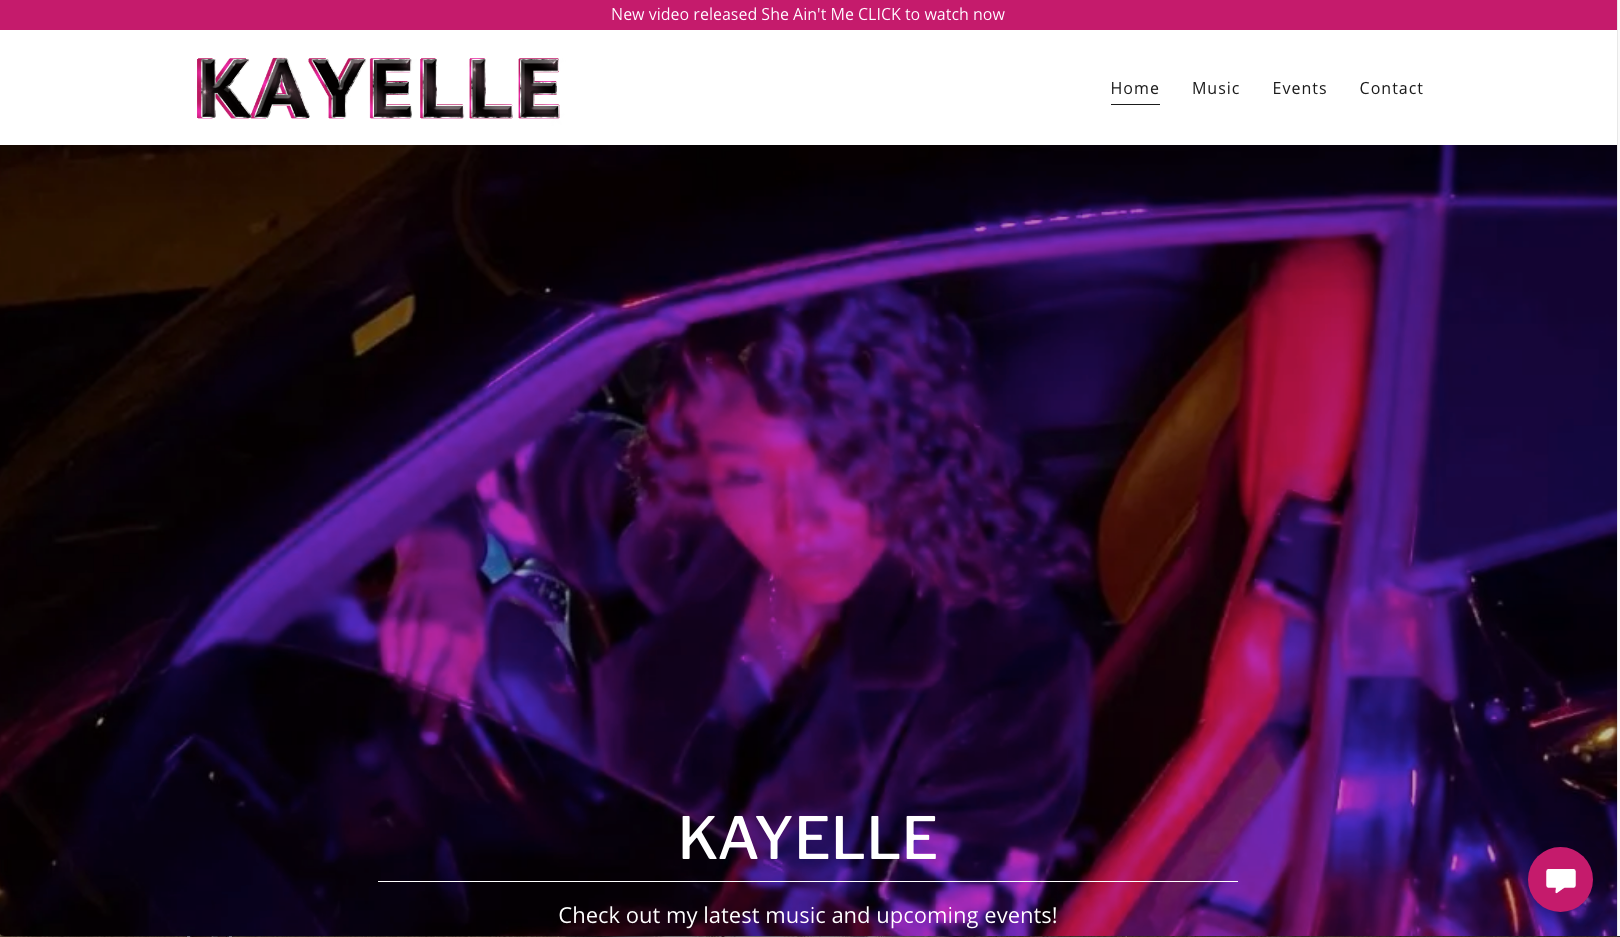 Kayelle Website - GoDaddy template